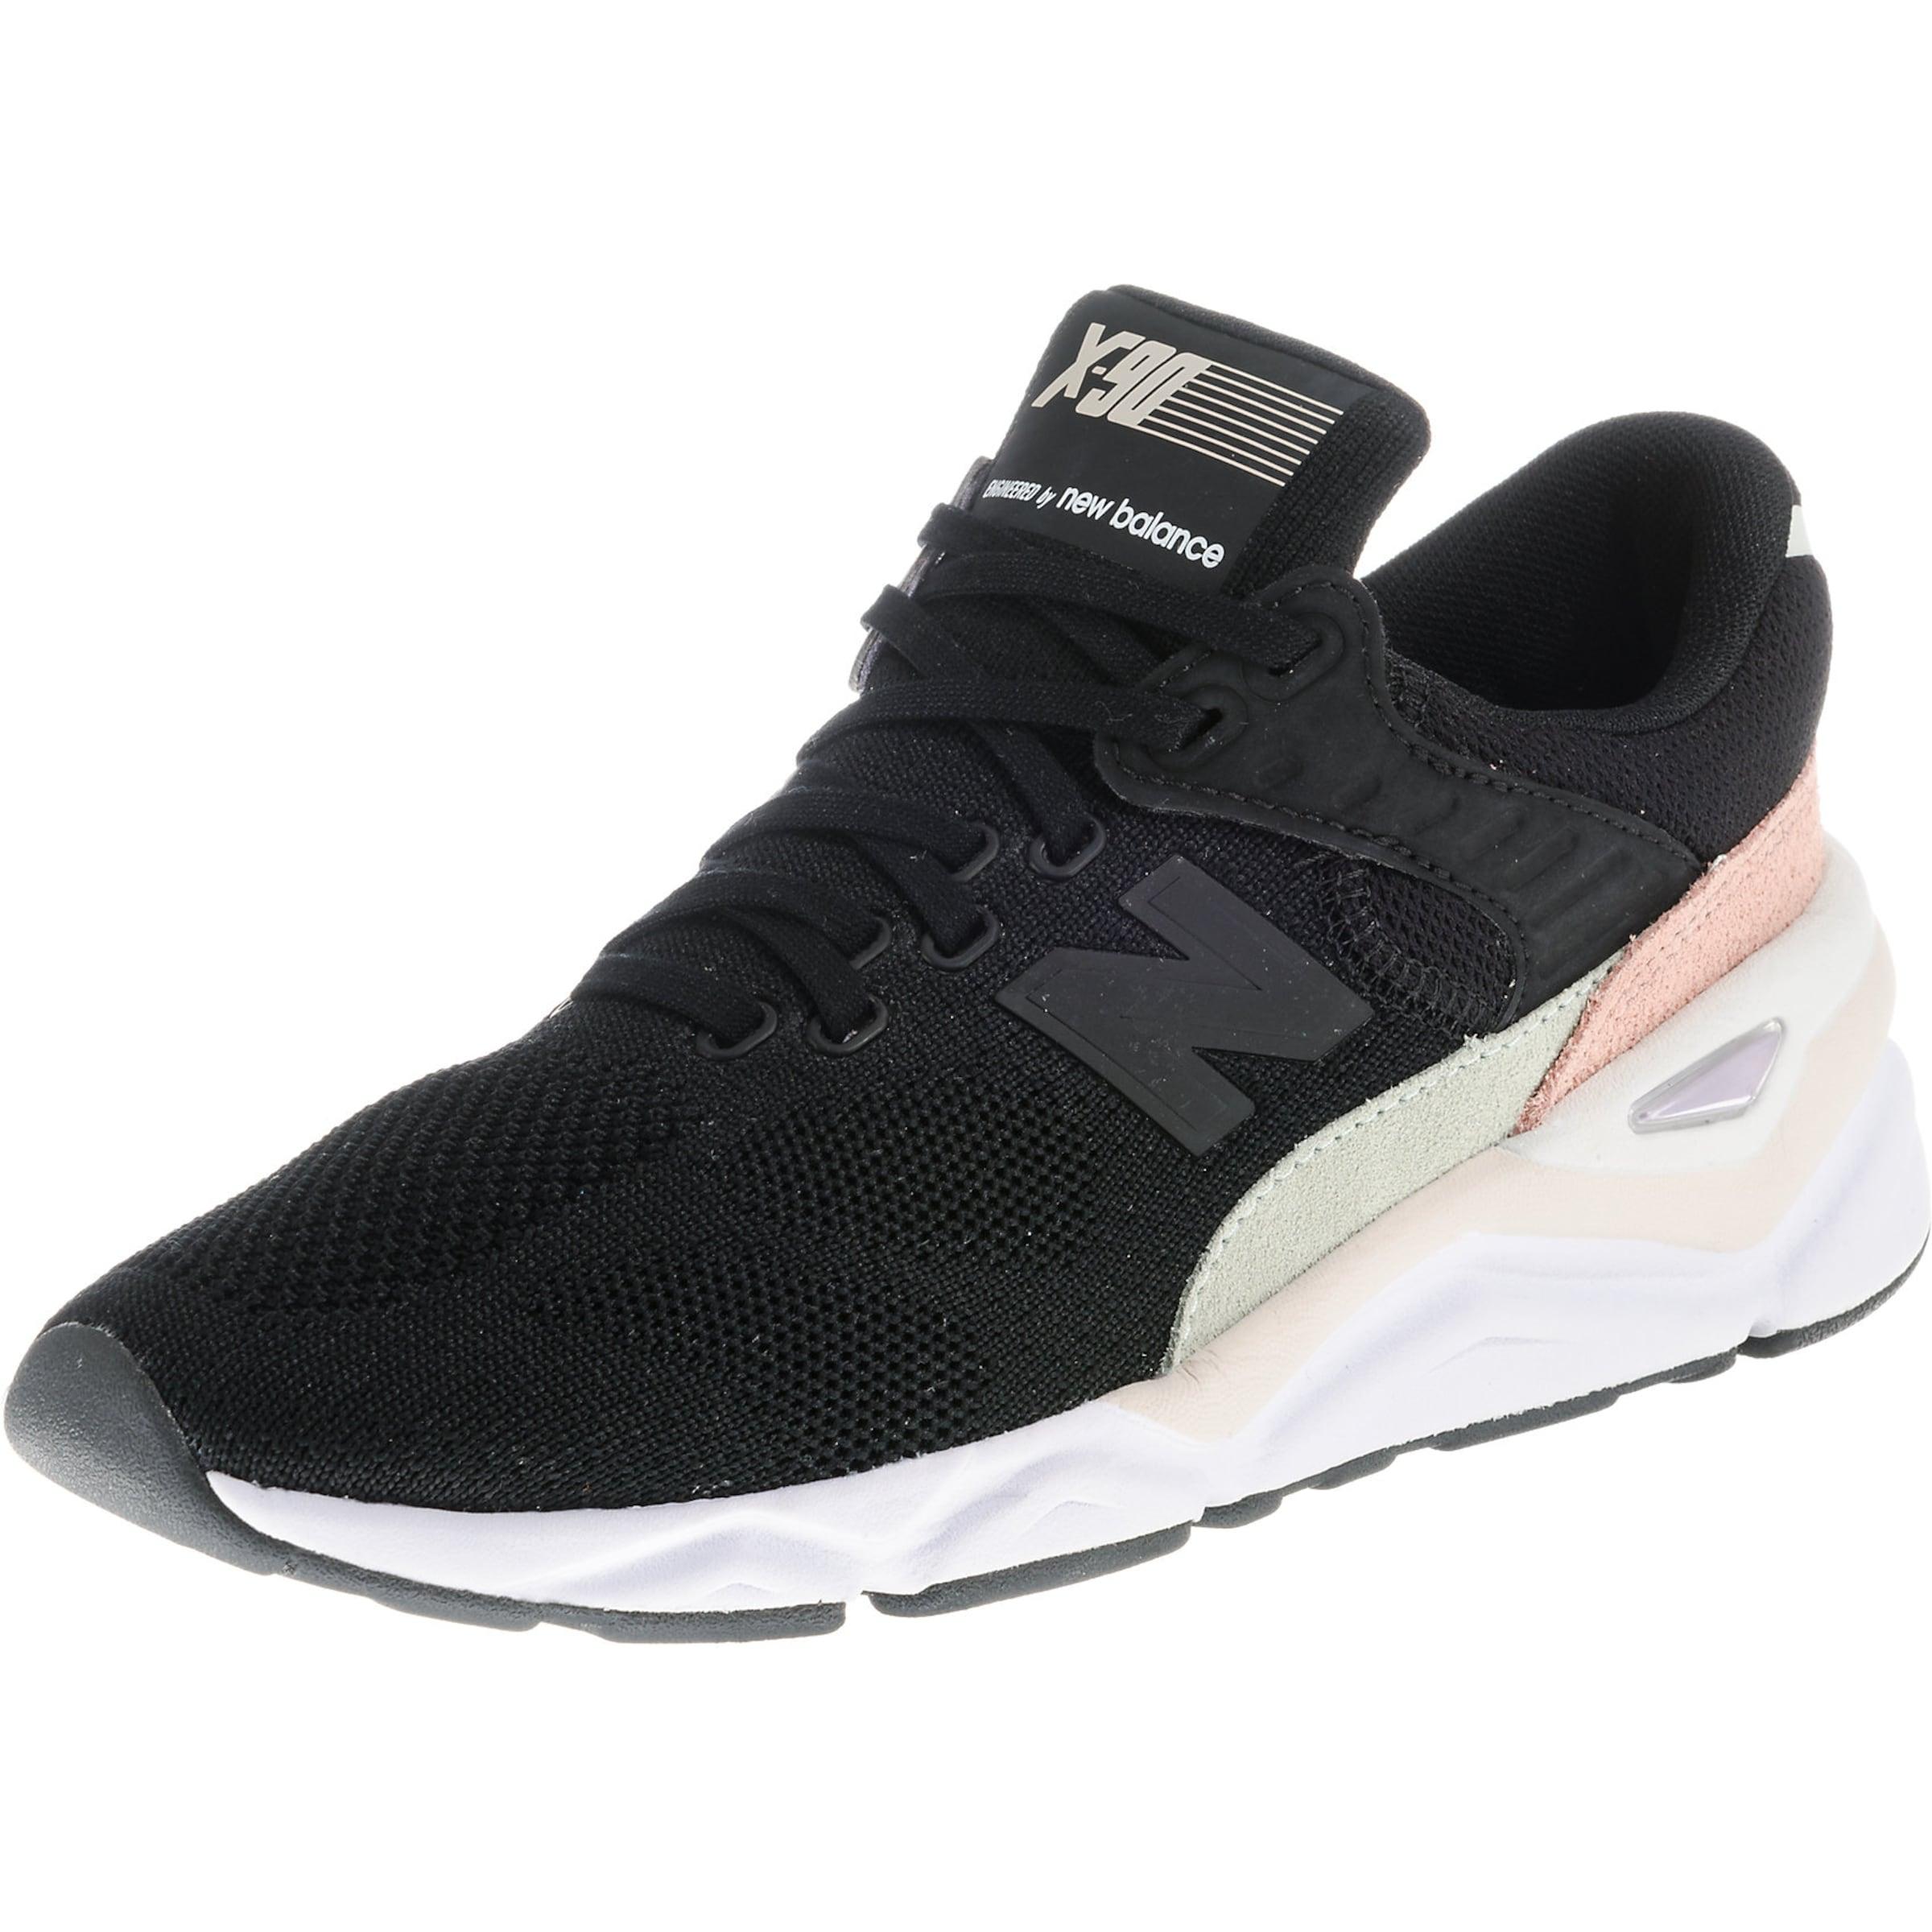 'wsx90' New Sneakers In Schwarz Balance AzurPastellpink OulPZiXwkT